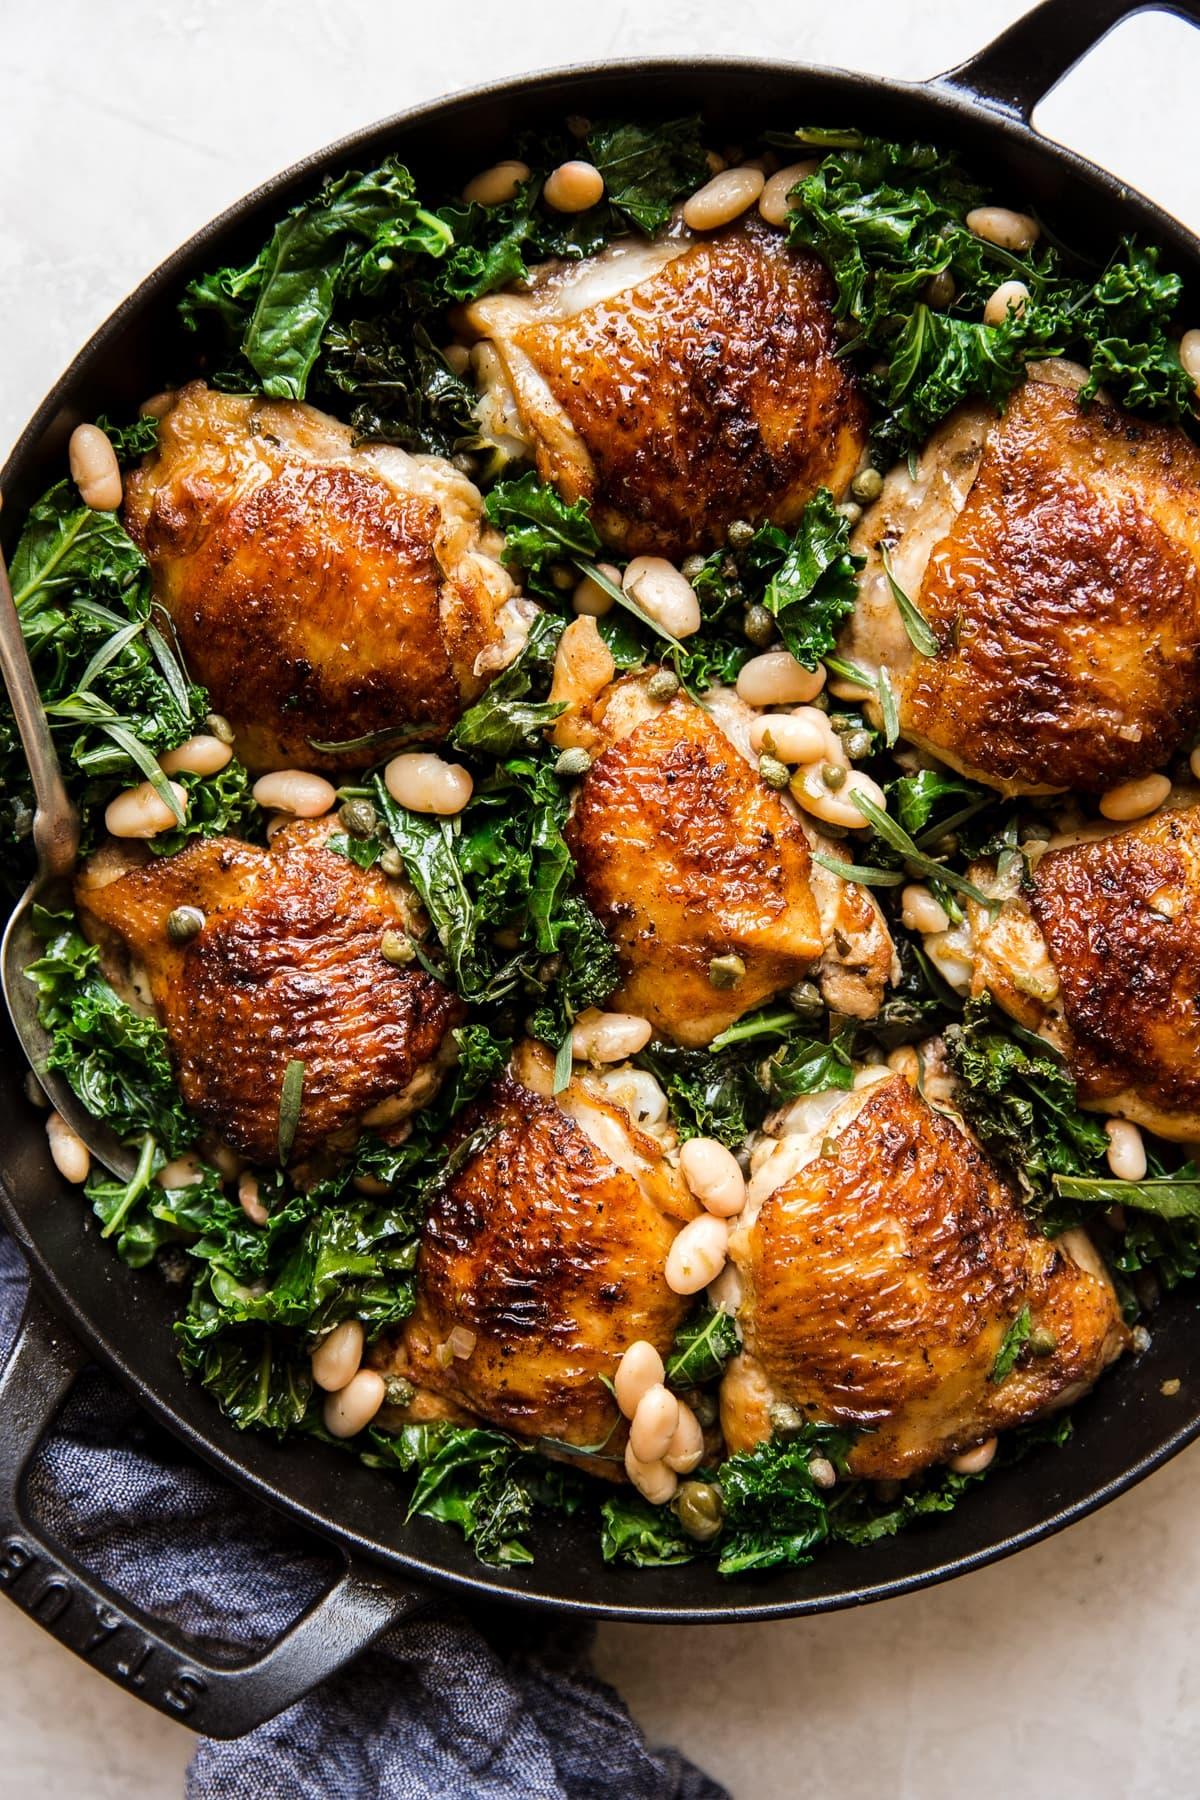 30 Best Chicken Thigh Recipes The Modern Proper